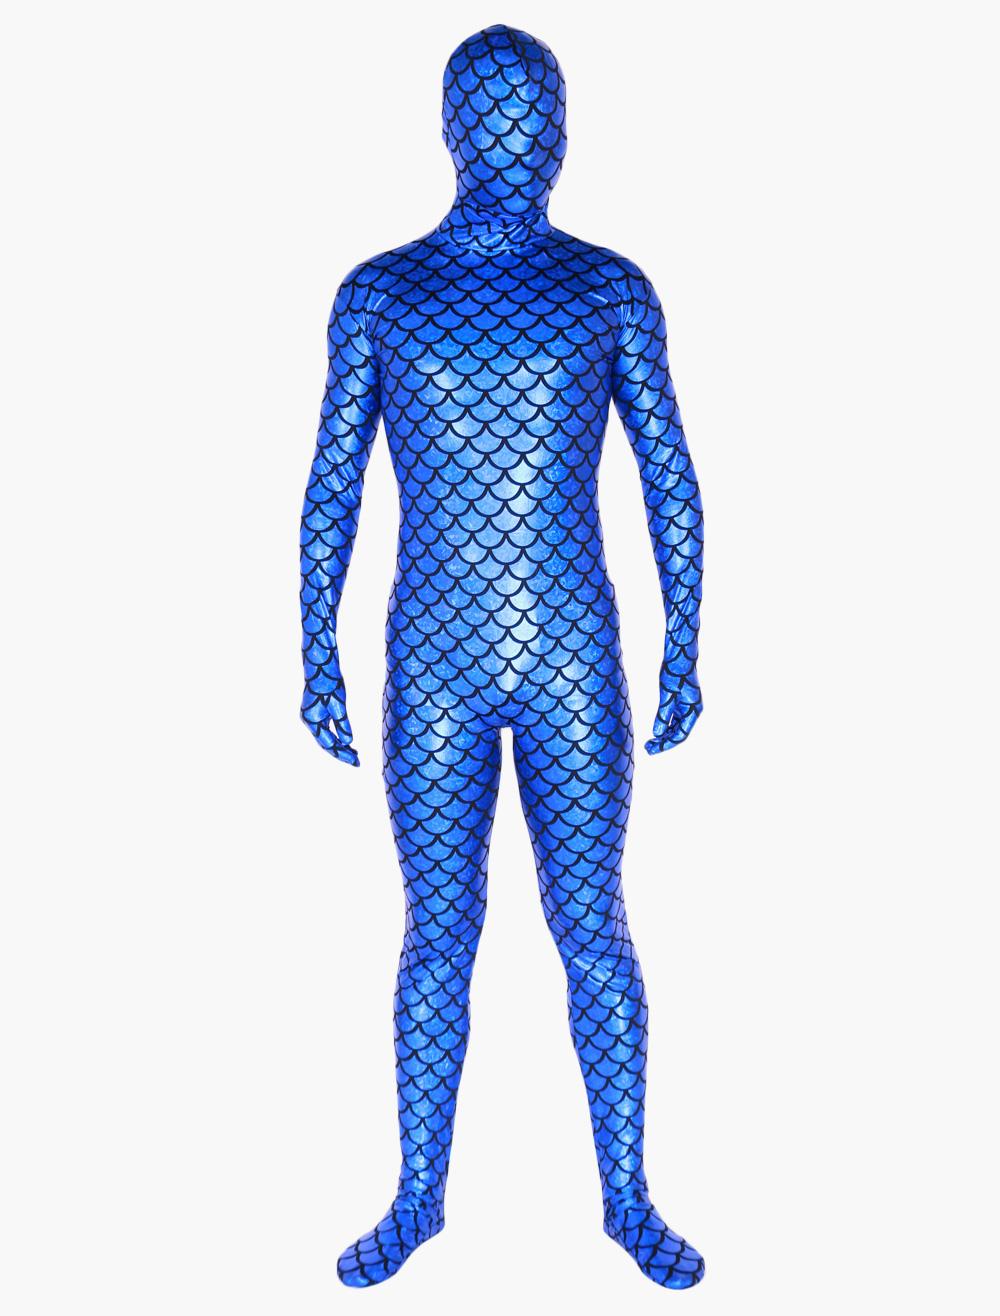 Plaid Pattern Unisex Zentai Suits Halloween